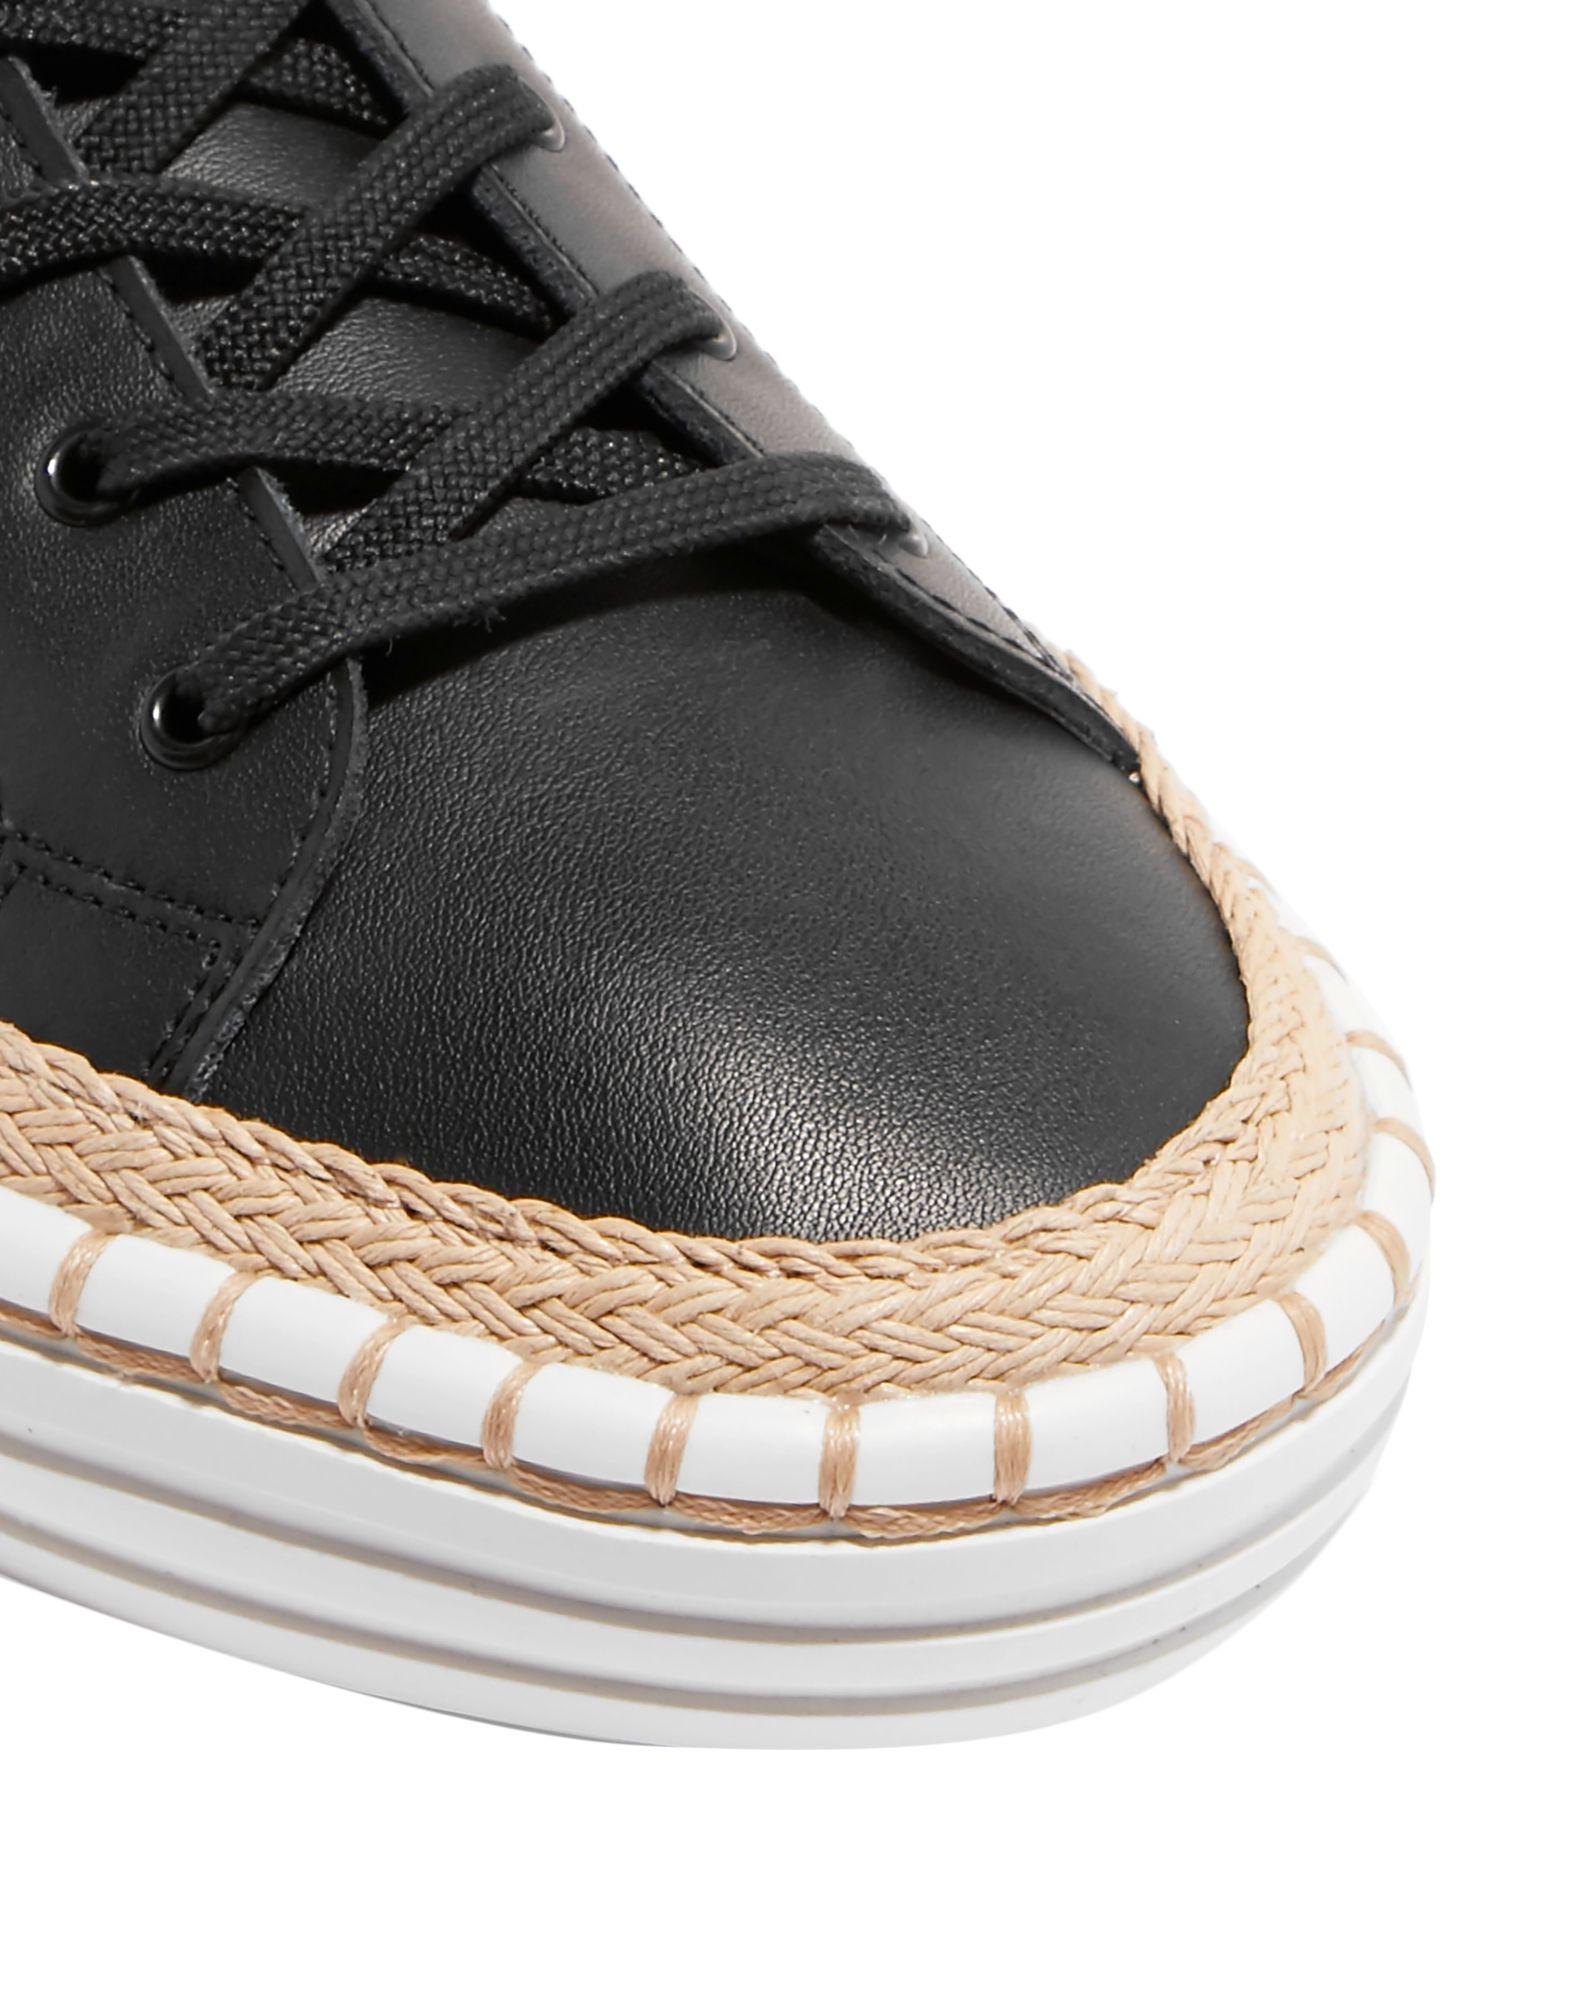 Sam Edelman Sneakers Qualität Damen  11559907RW Gute Qualität Sneakers beliebte Schuhe 32e7ab